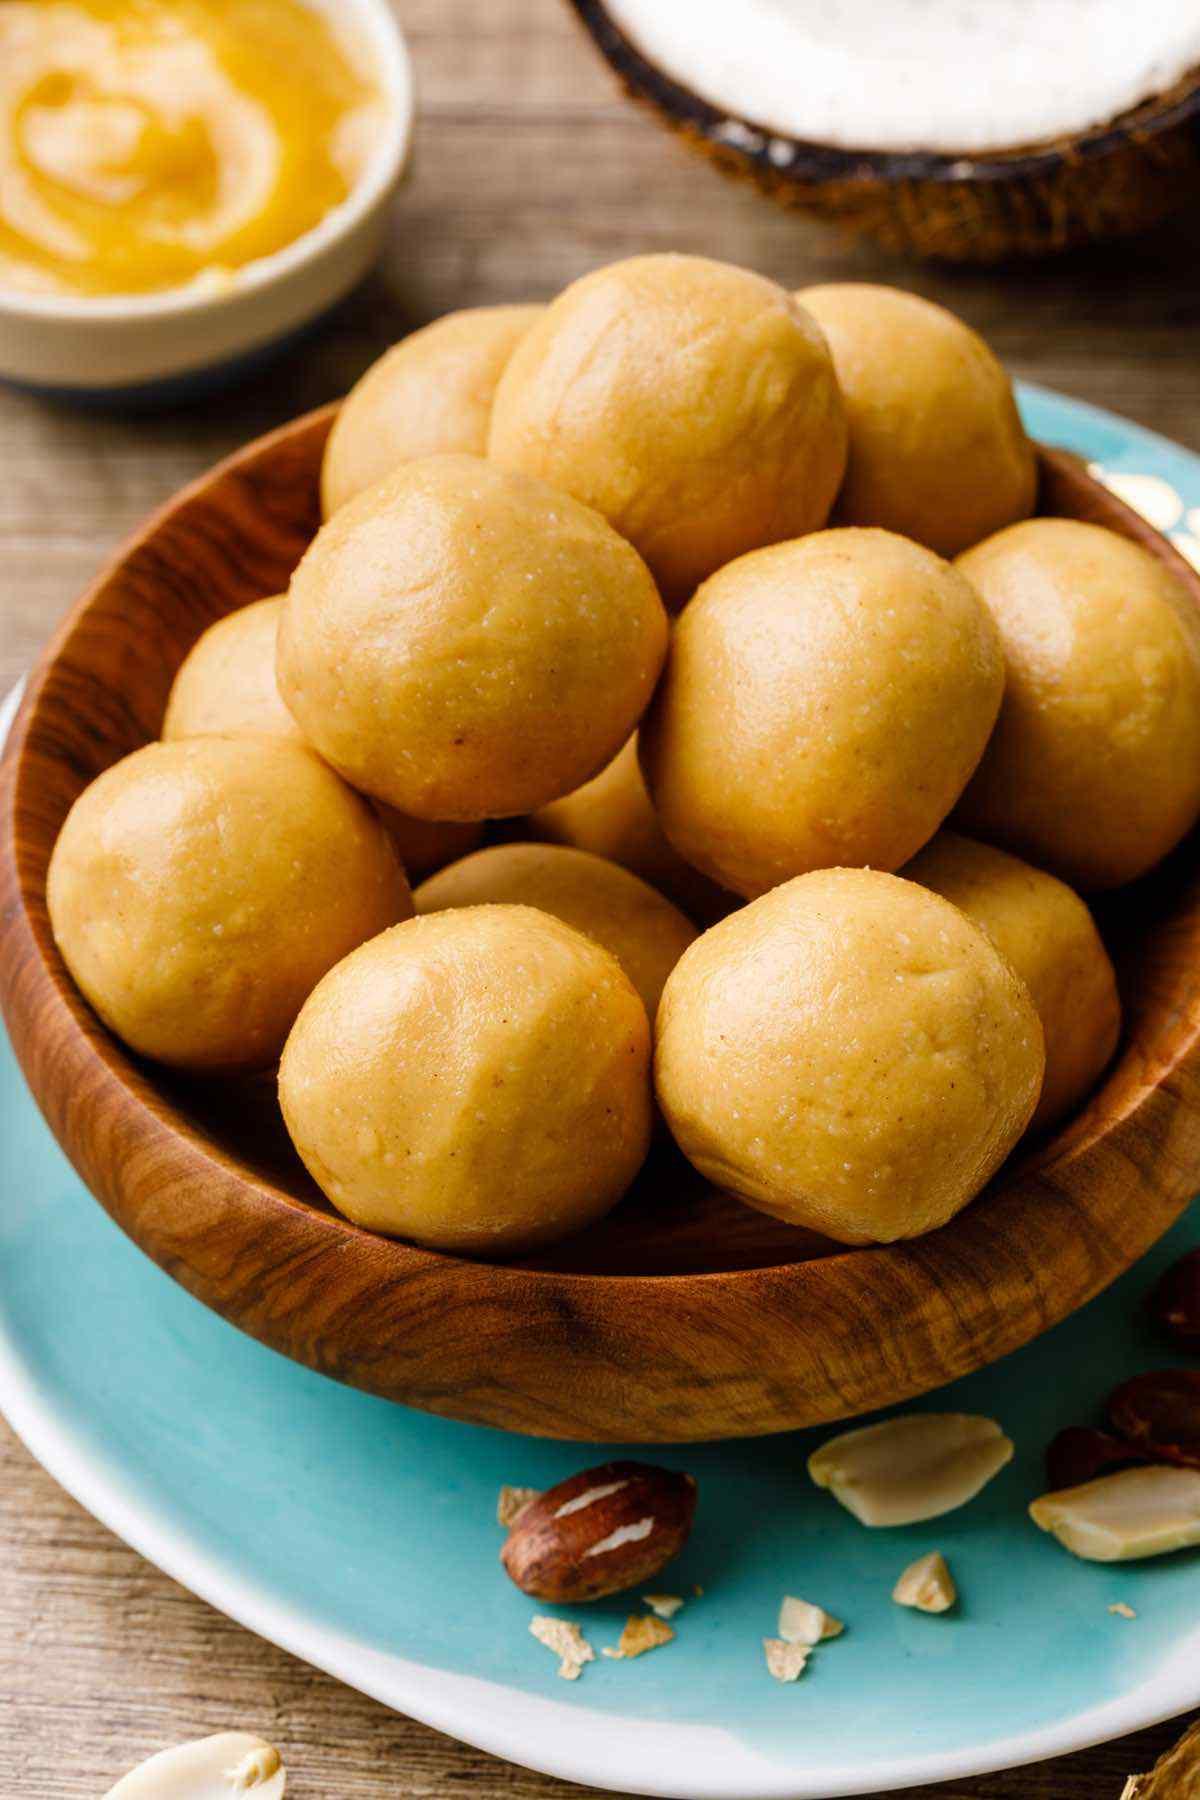 Homemade 3-Ingredient Peanut Butter Protein Balls